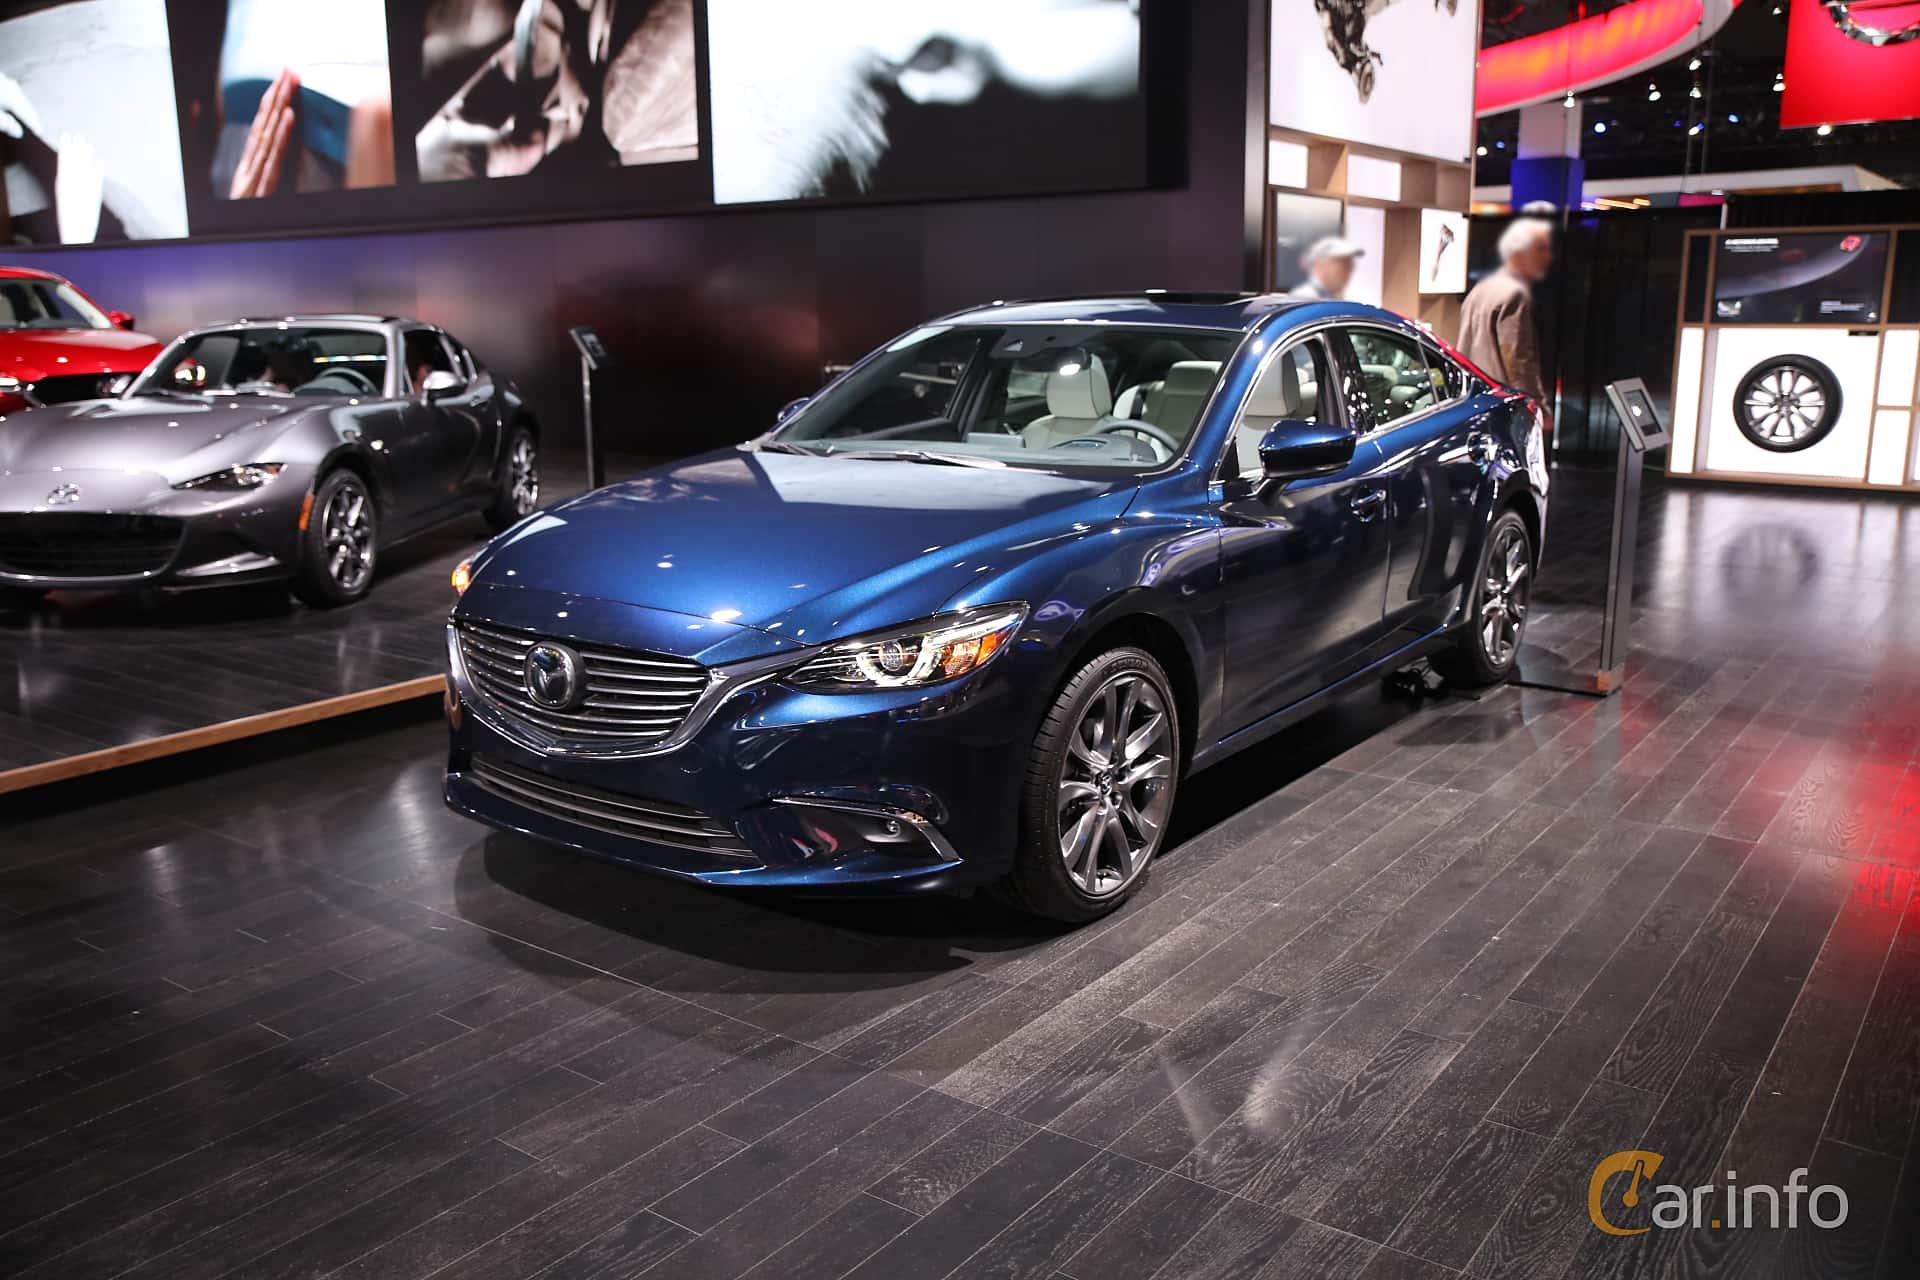 Mazda 6 Sedan 2.5 SKYACTIV-G Automatic, 192hp, 2017 at North American International Auto Show 2017